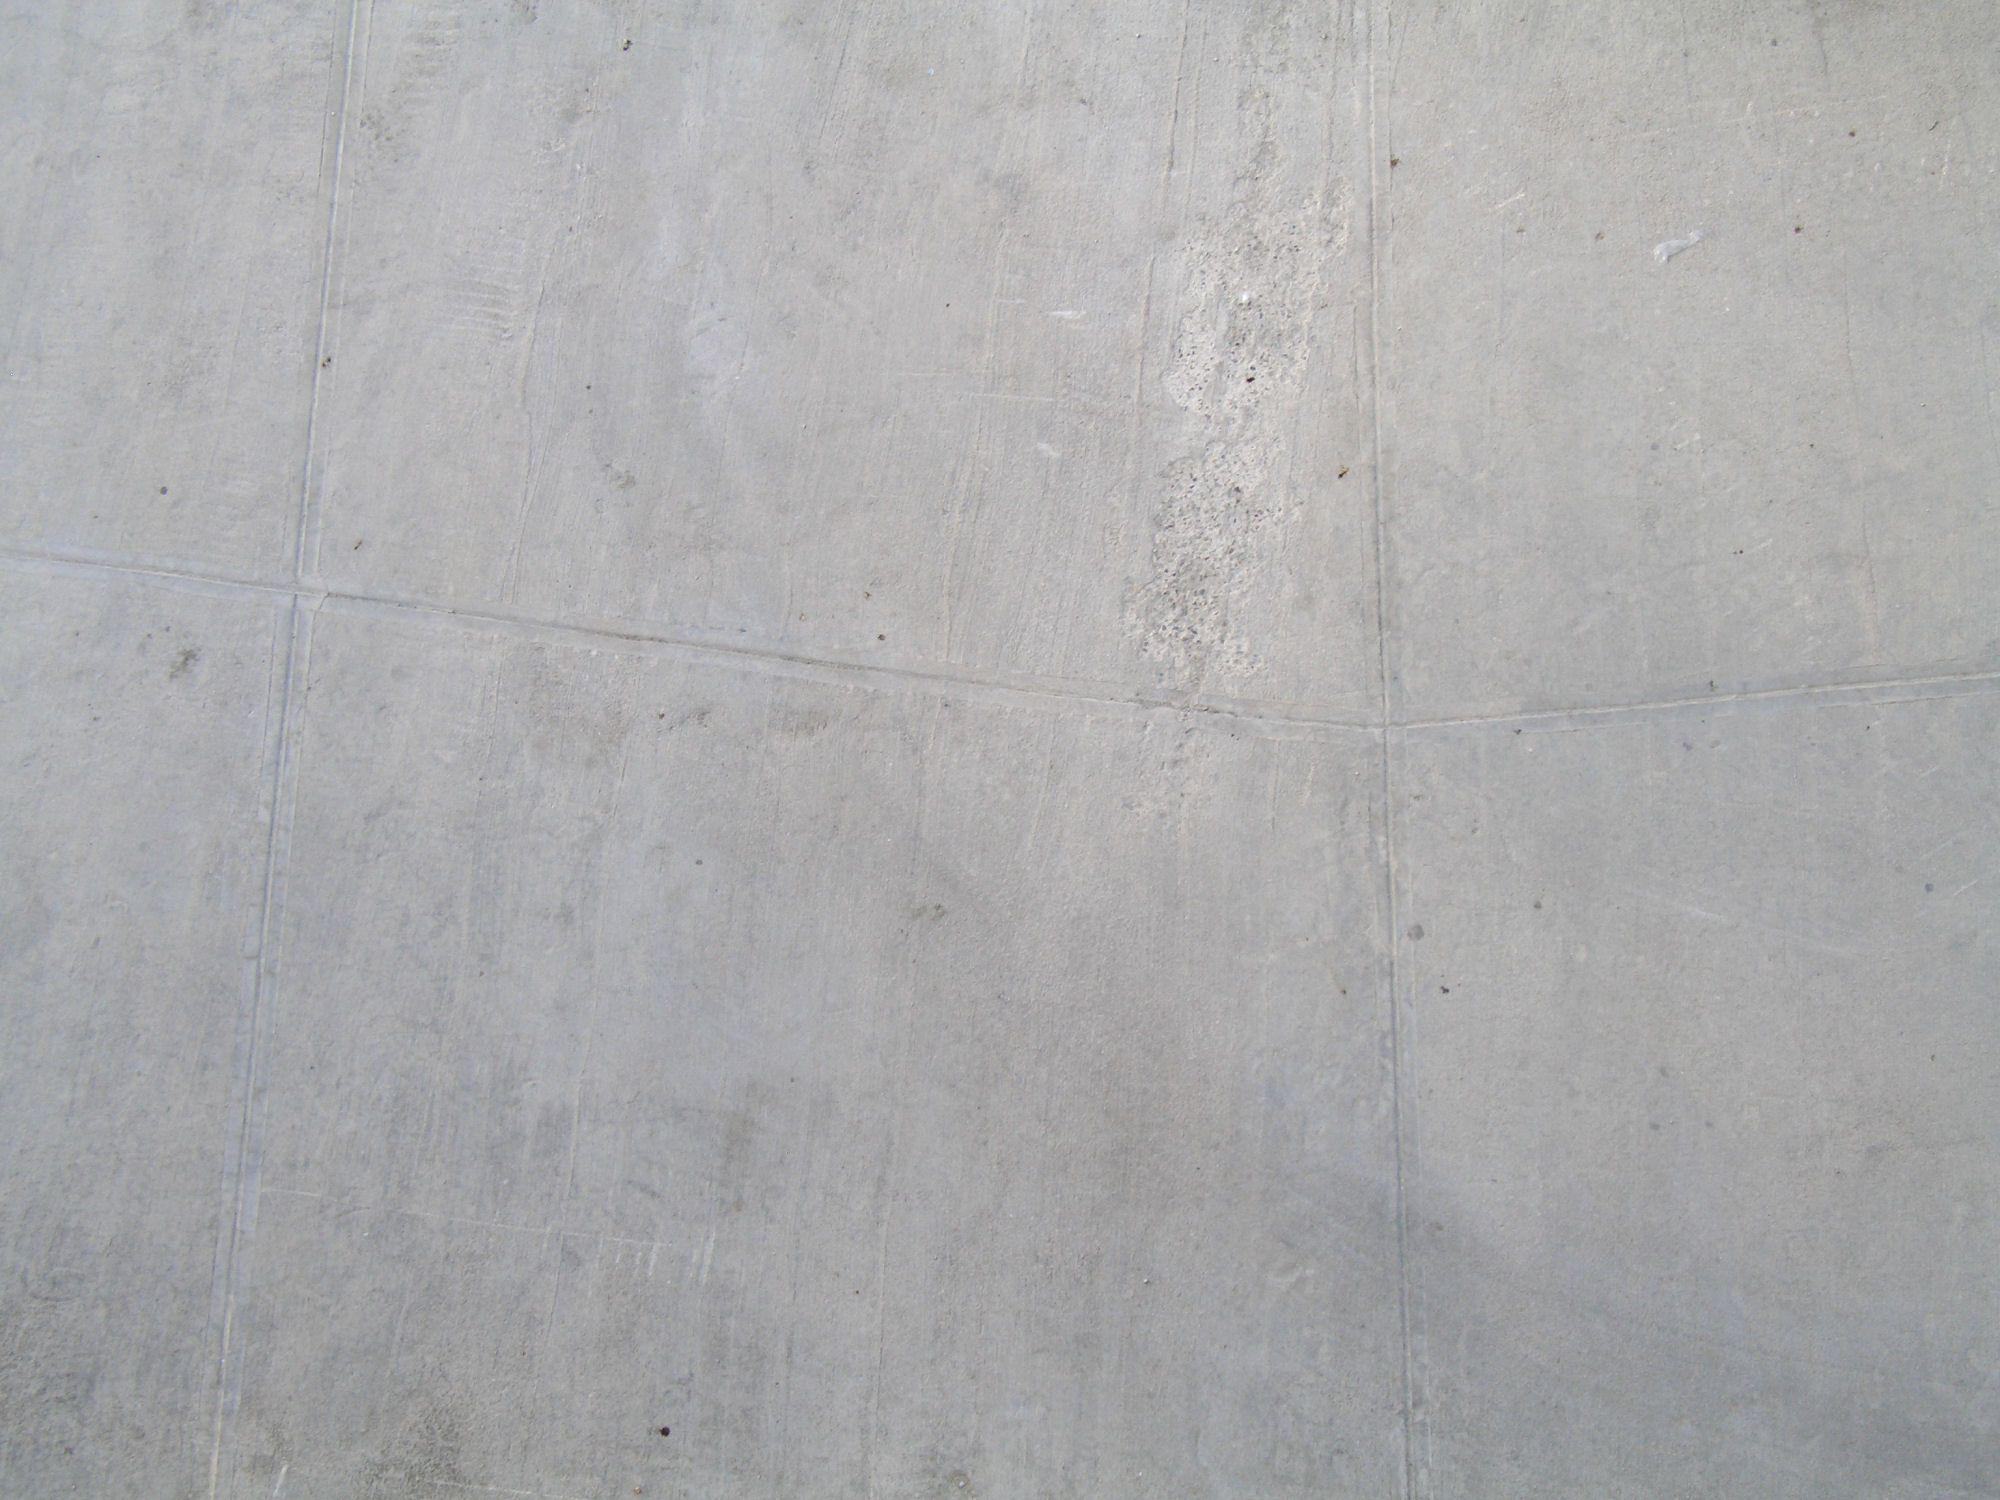 Photolizer Material And Concrete Concrete Texture Concrete Floor Texture Cement Texture